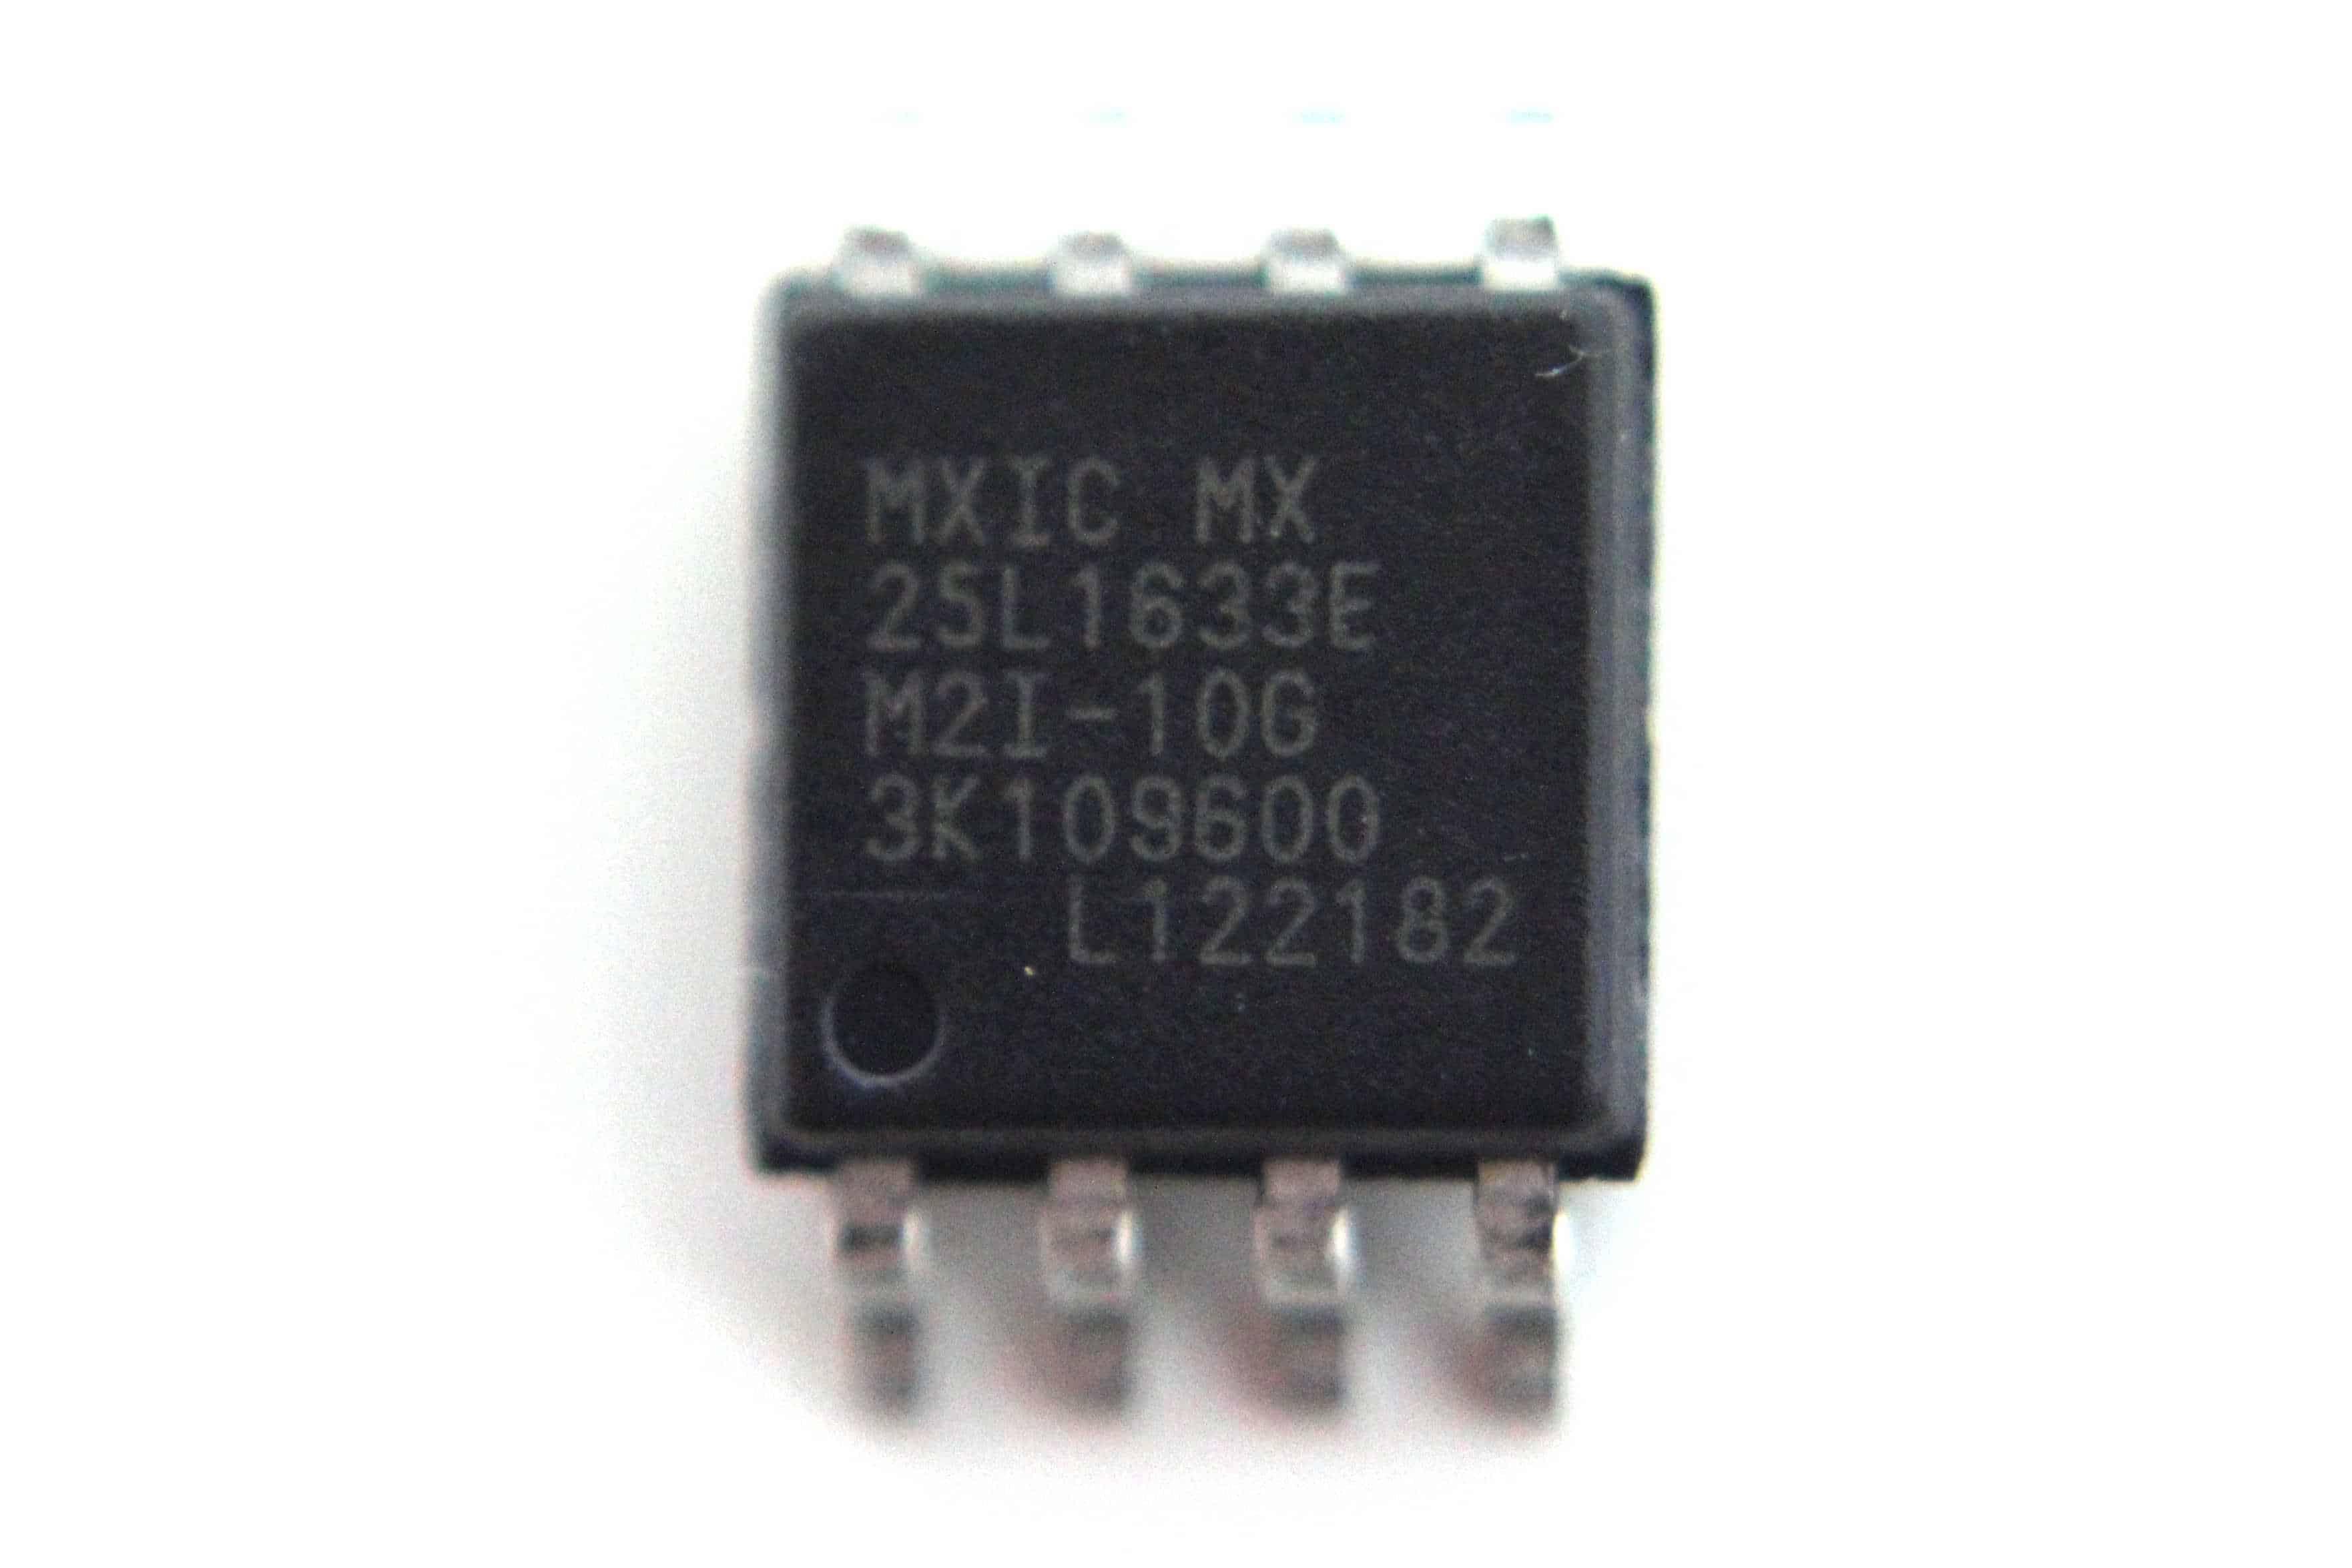 MXIC MX 25L1633E 25L16 Flash Memory SERIAL EEPROM BIOS CHIP